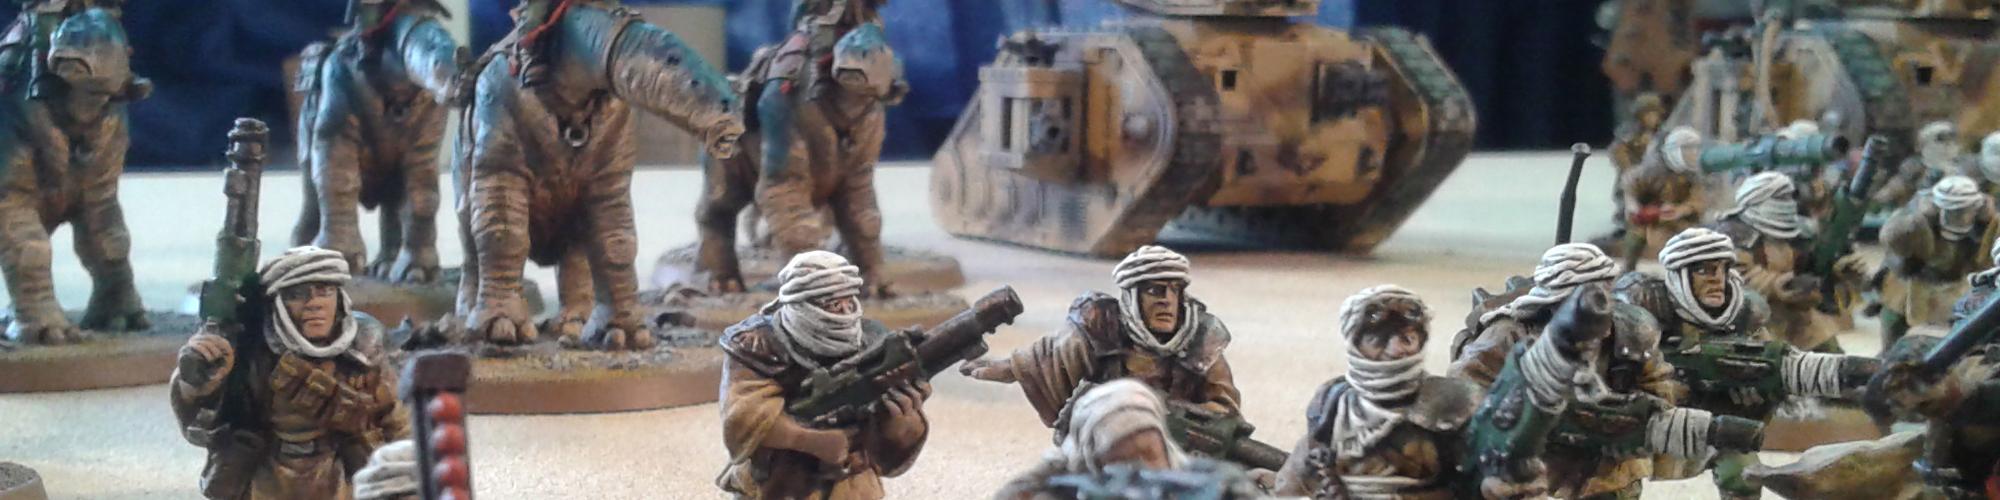 The Desert Scorpions